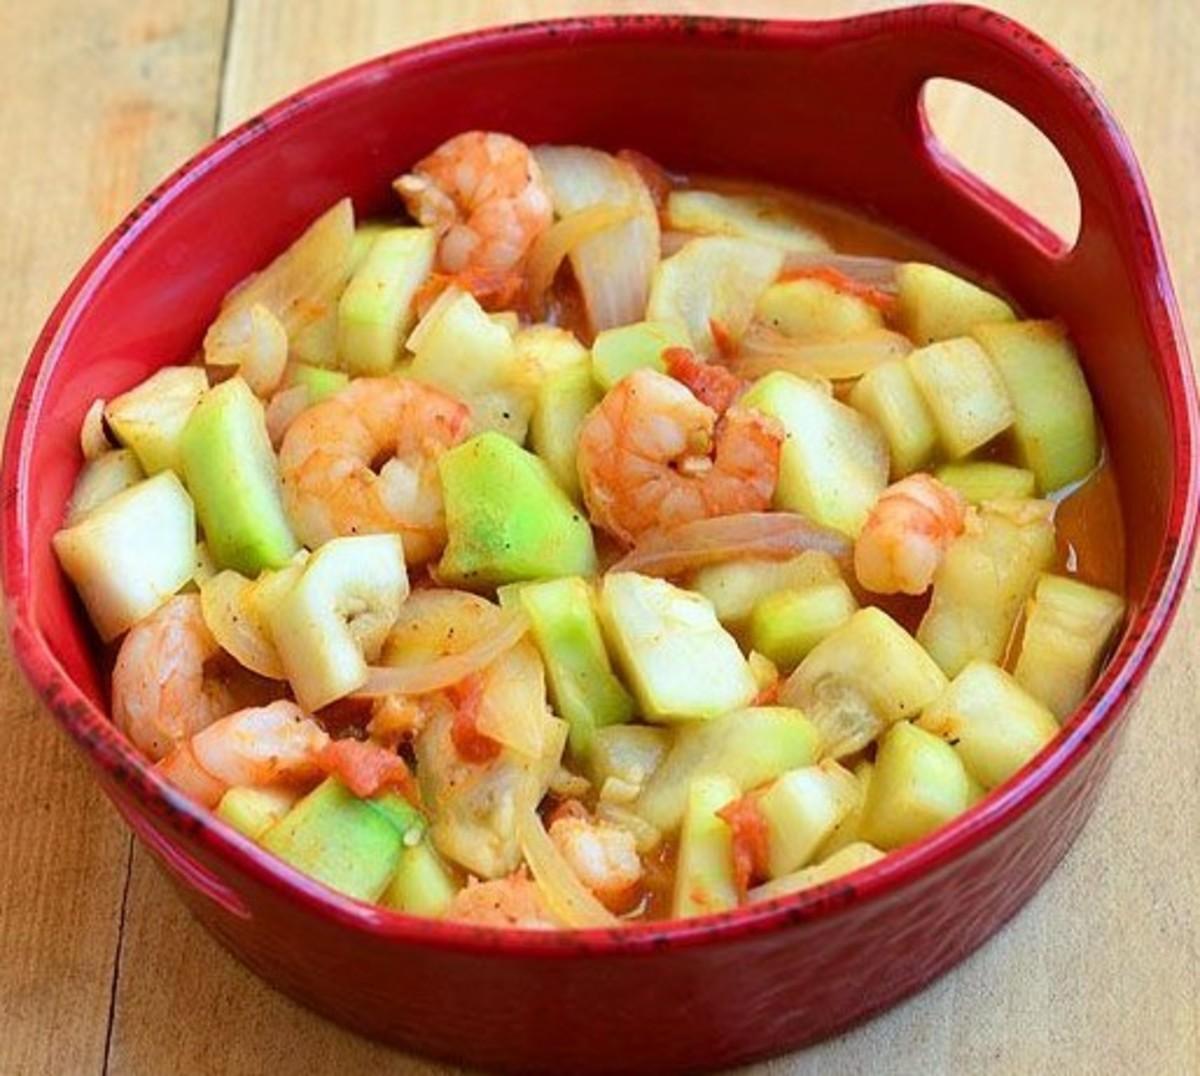 Filipino Stir-Fried Upo Squash and Prawns With Bagoong (Shrimp Paste)